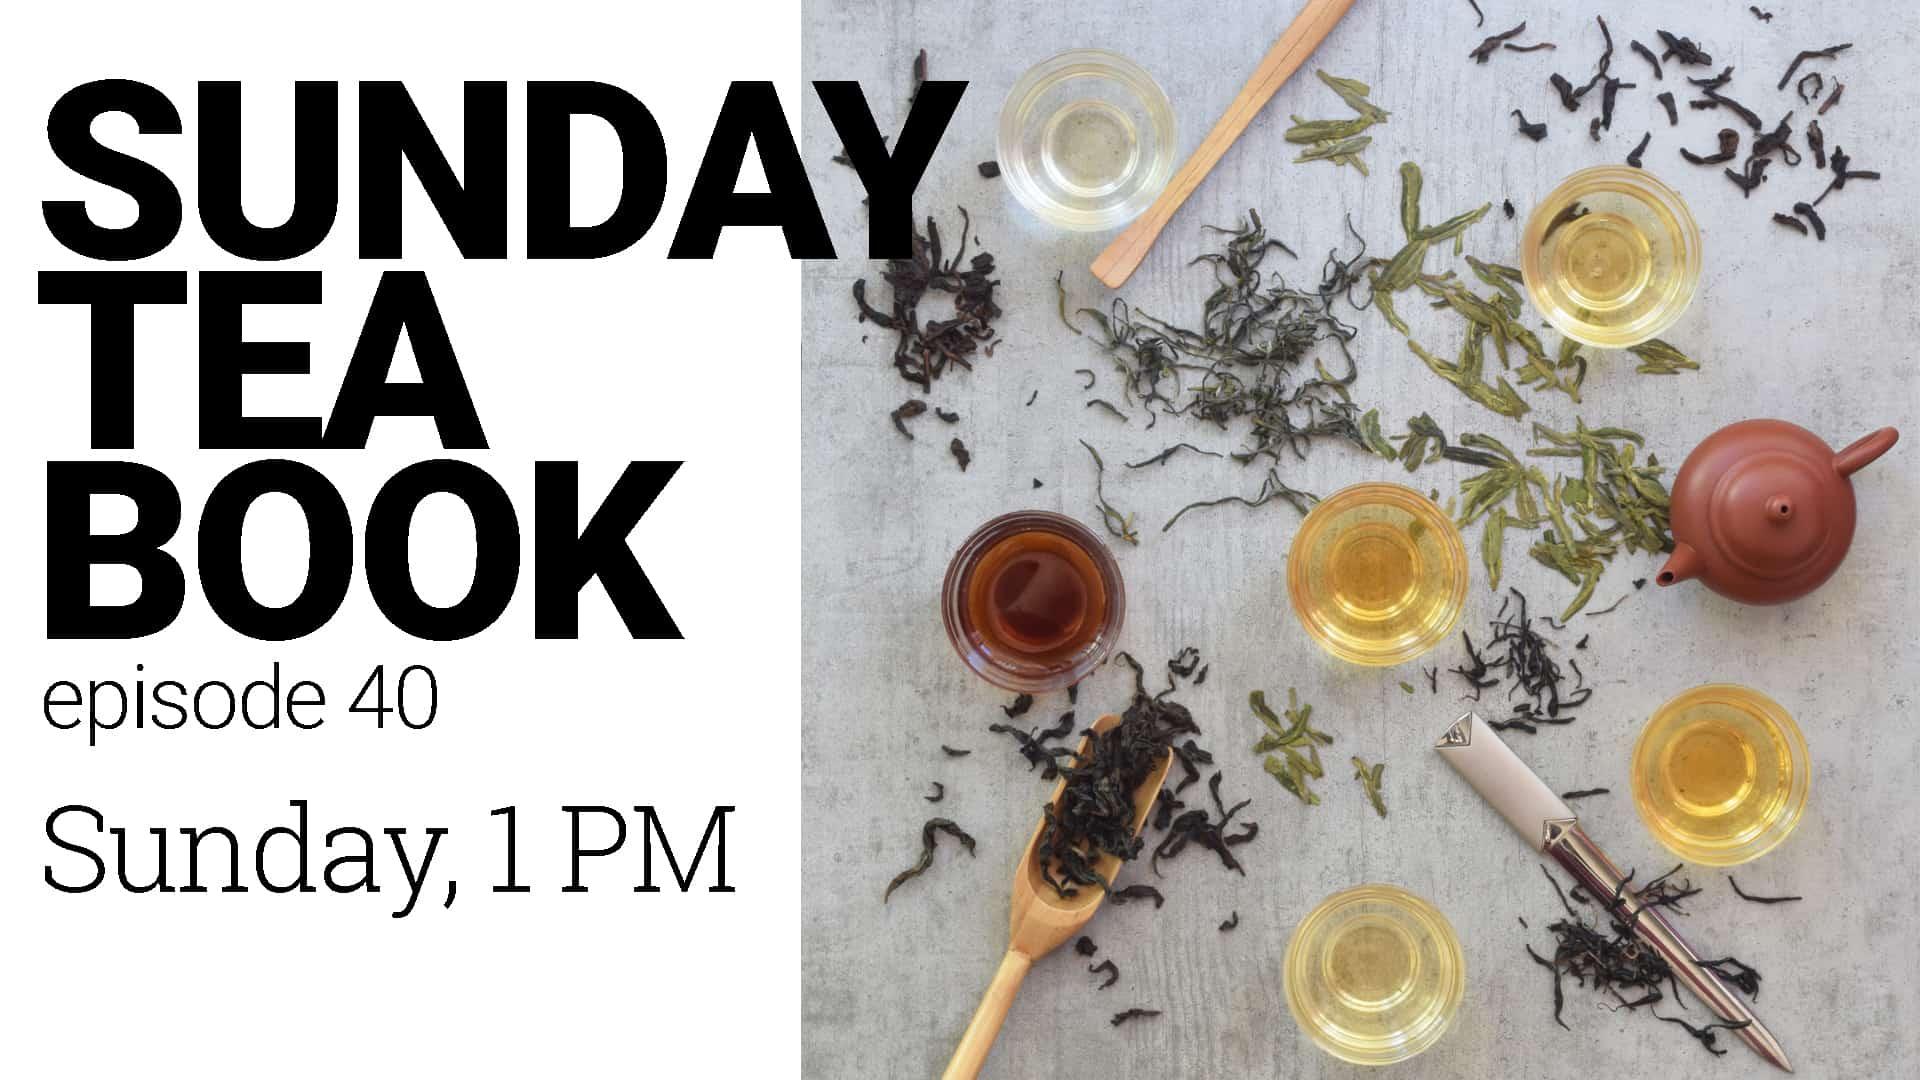 Sunday Tea Book ep.40 | The Origin of 6 Tea Types - Tea Colors and Tea Types